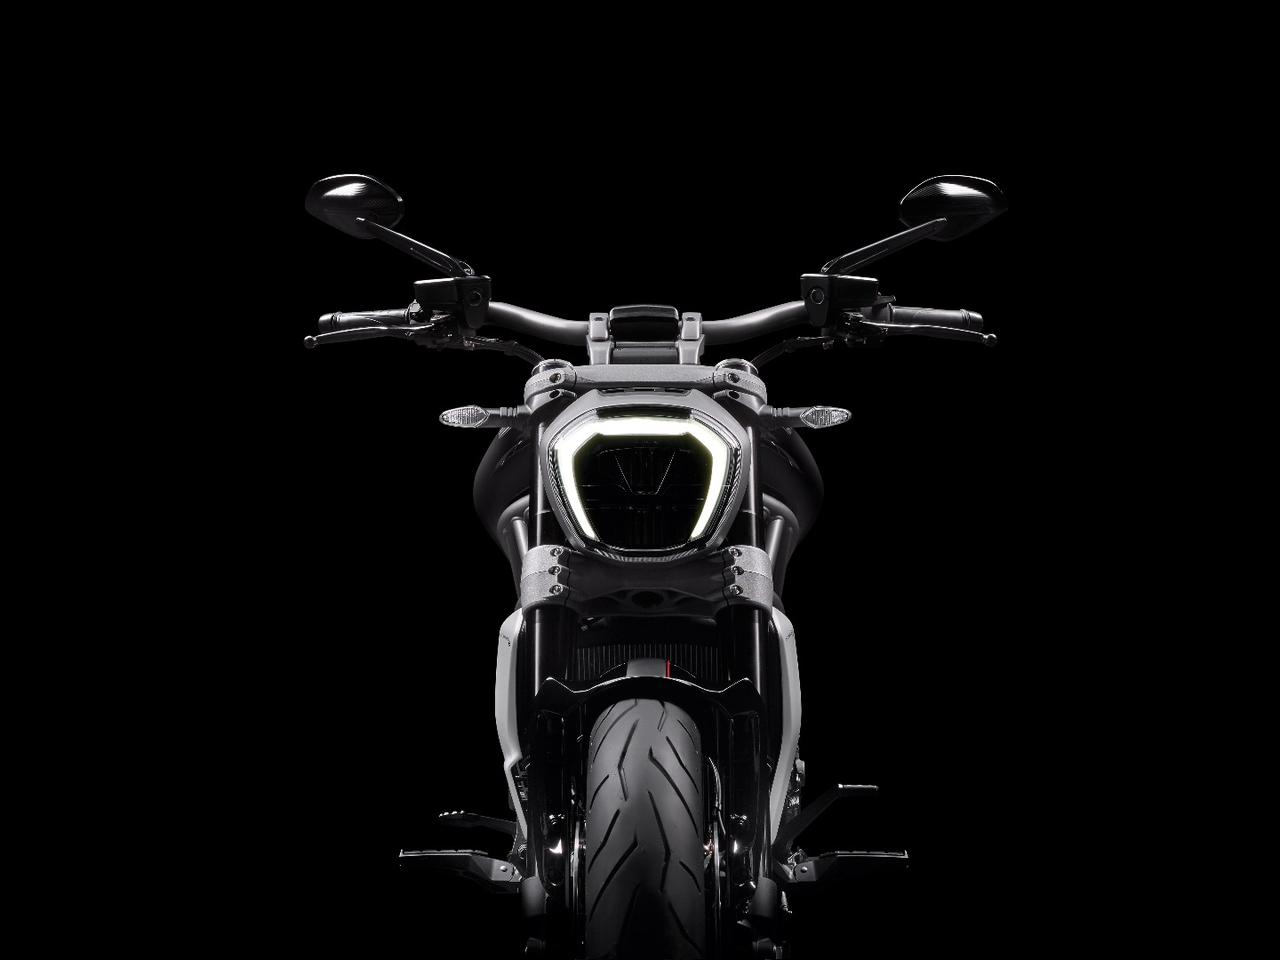 Ducati XDiavel S: daytime driving light